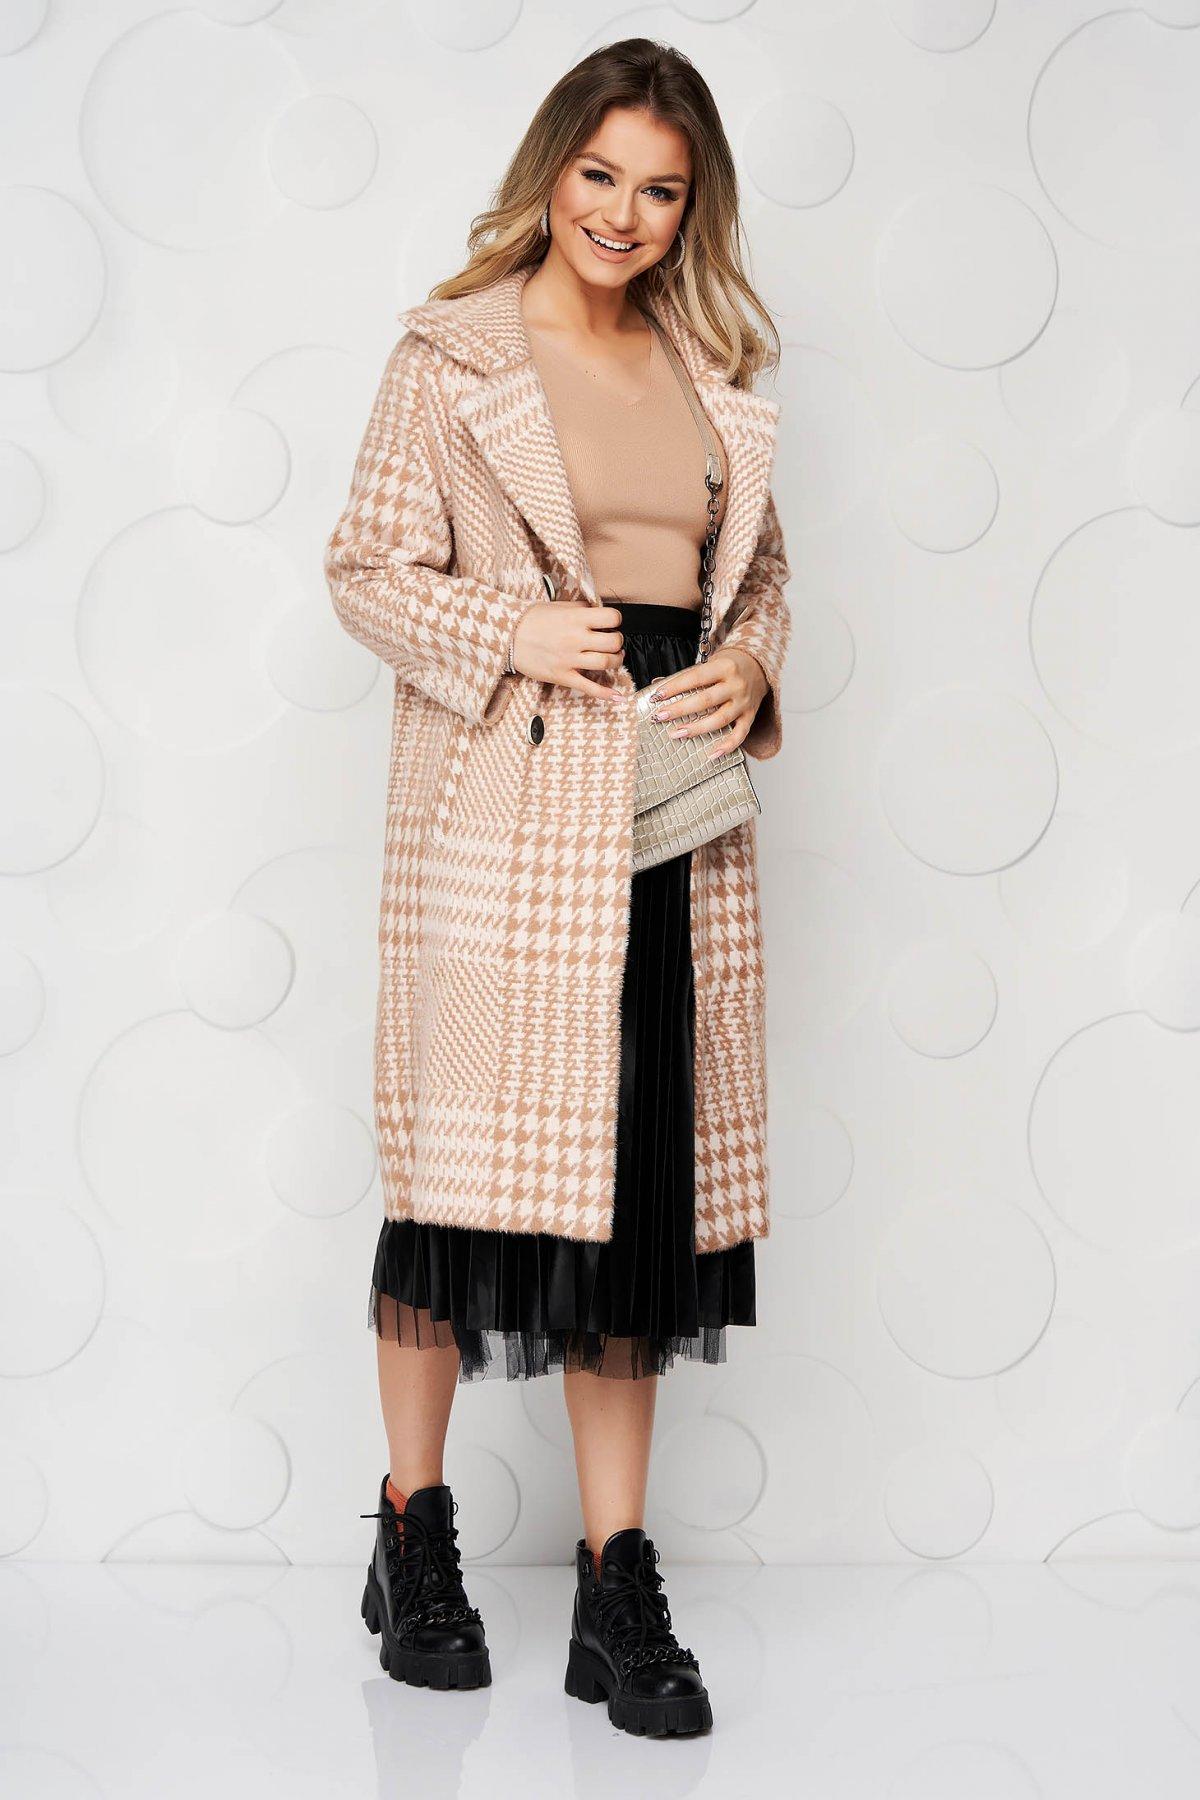 Palton SunShine cappuccino elegant din lana cu croi larg in carouri